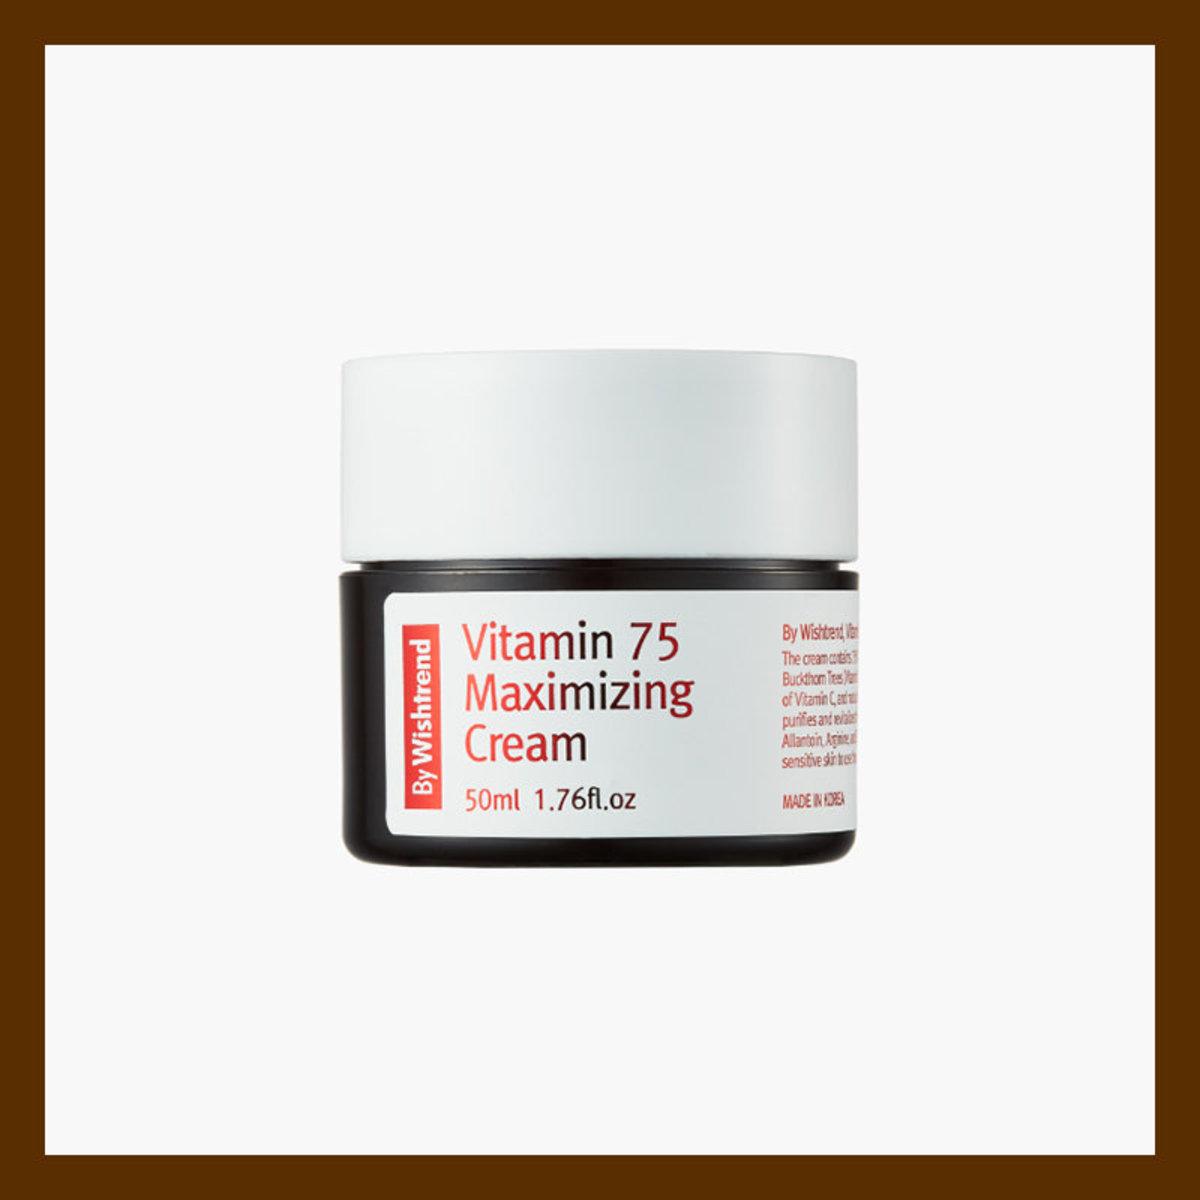 BY WISHTREND Vitamin75 Maximizing Cream 維他命亮肌面霜 50ml